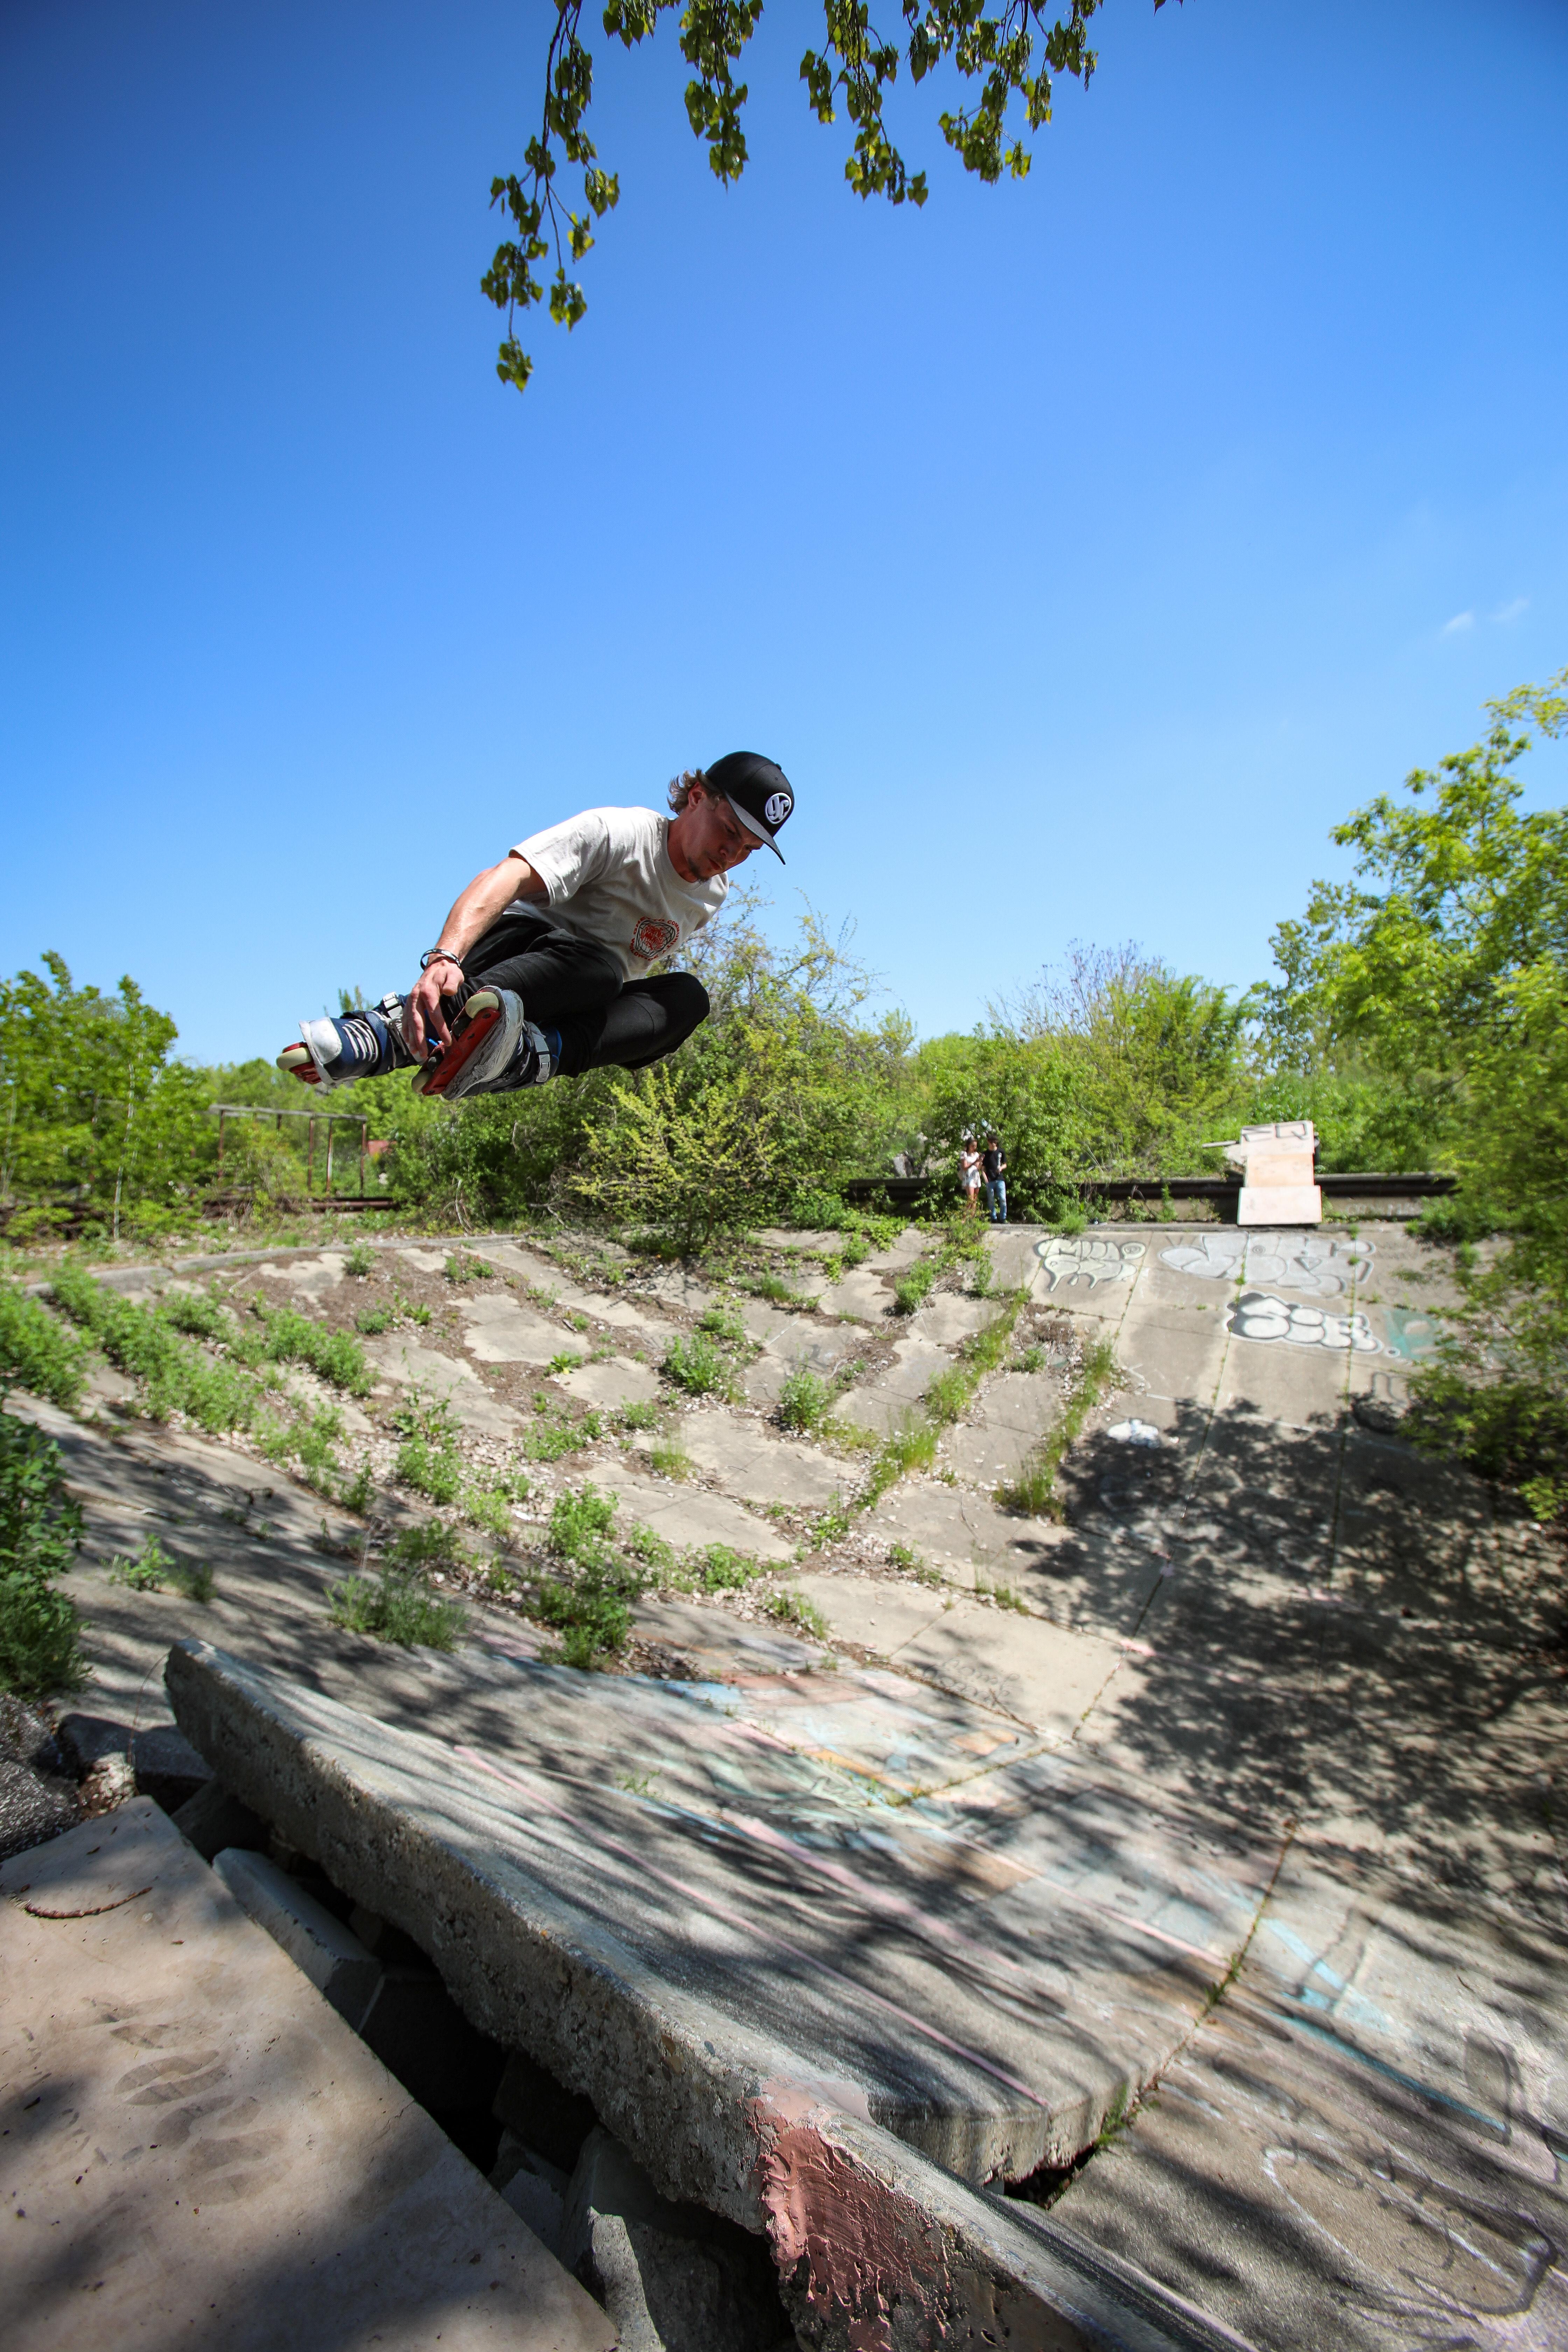 Zack Savage action